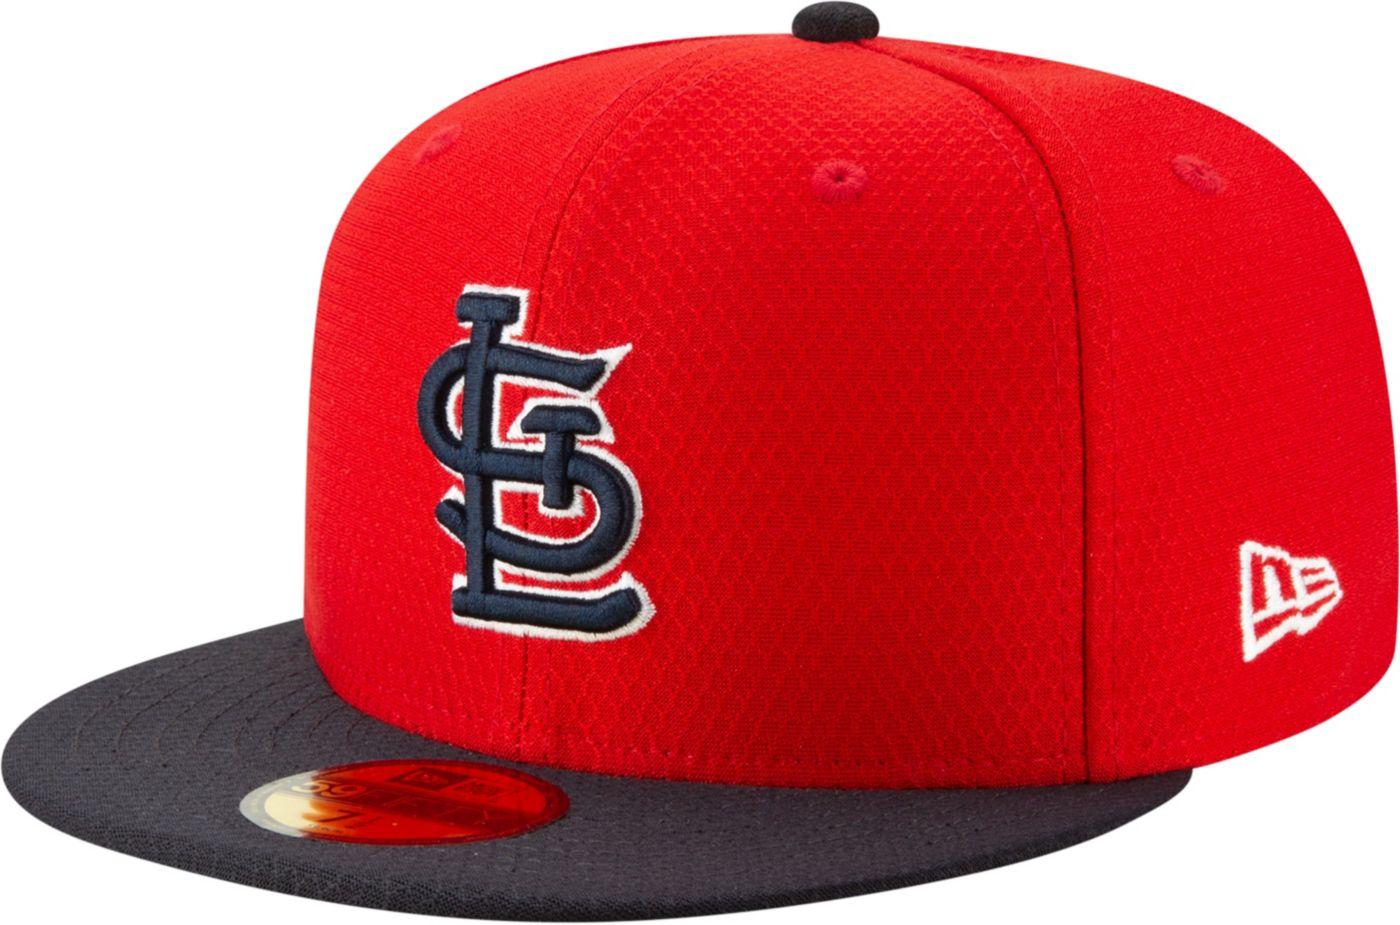 New Era Men's St. Louis Cardinals 59Fifty HexTech Batting Practice Fitted Hat